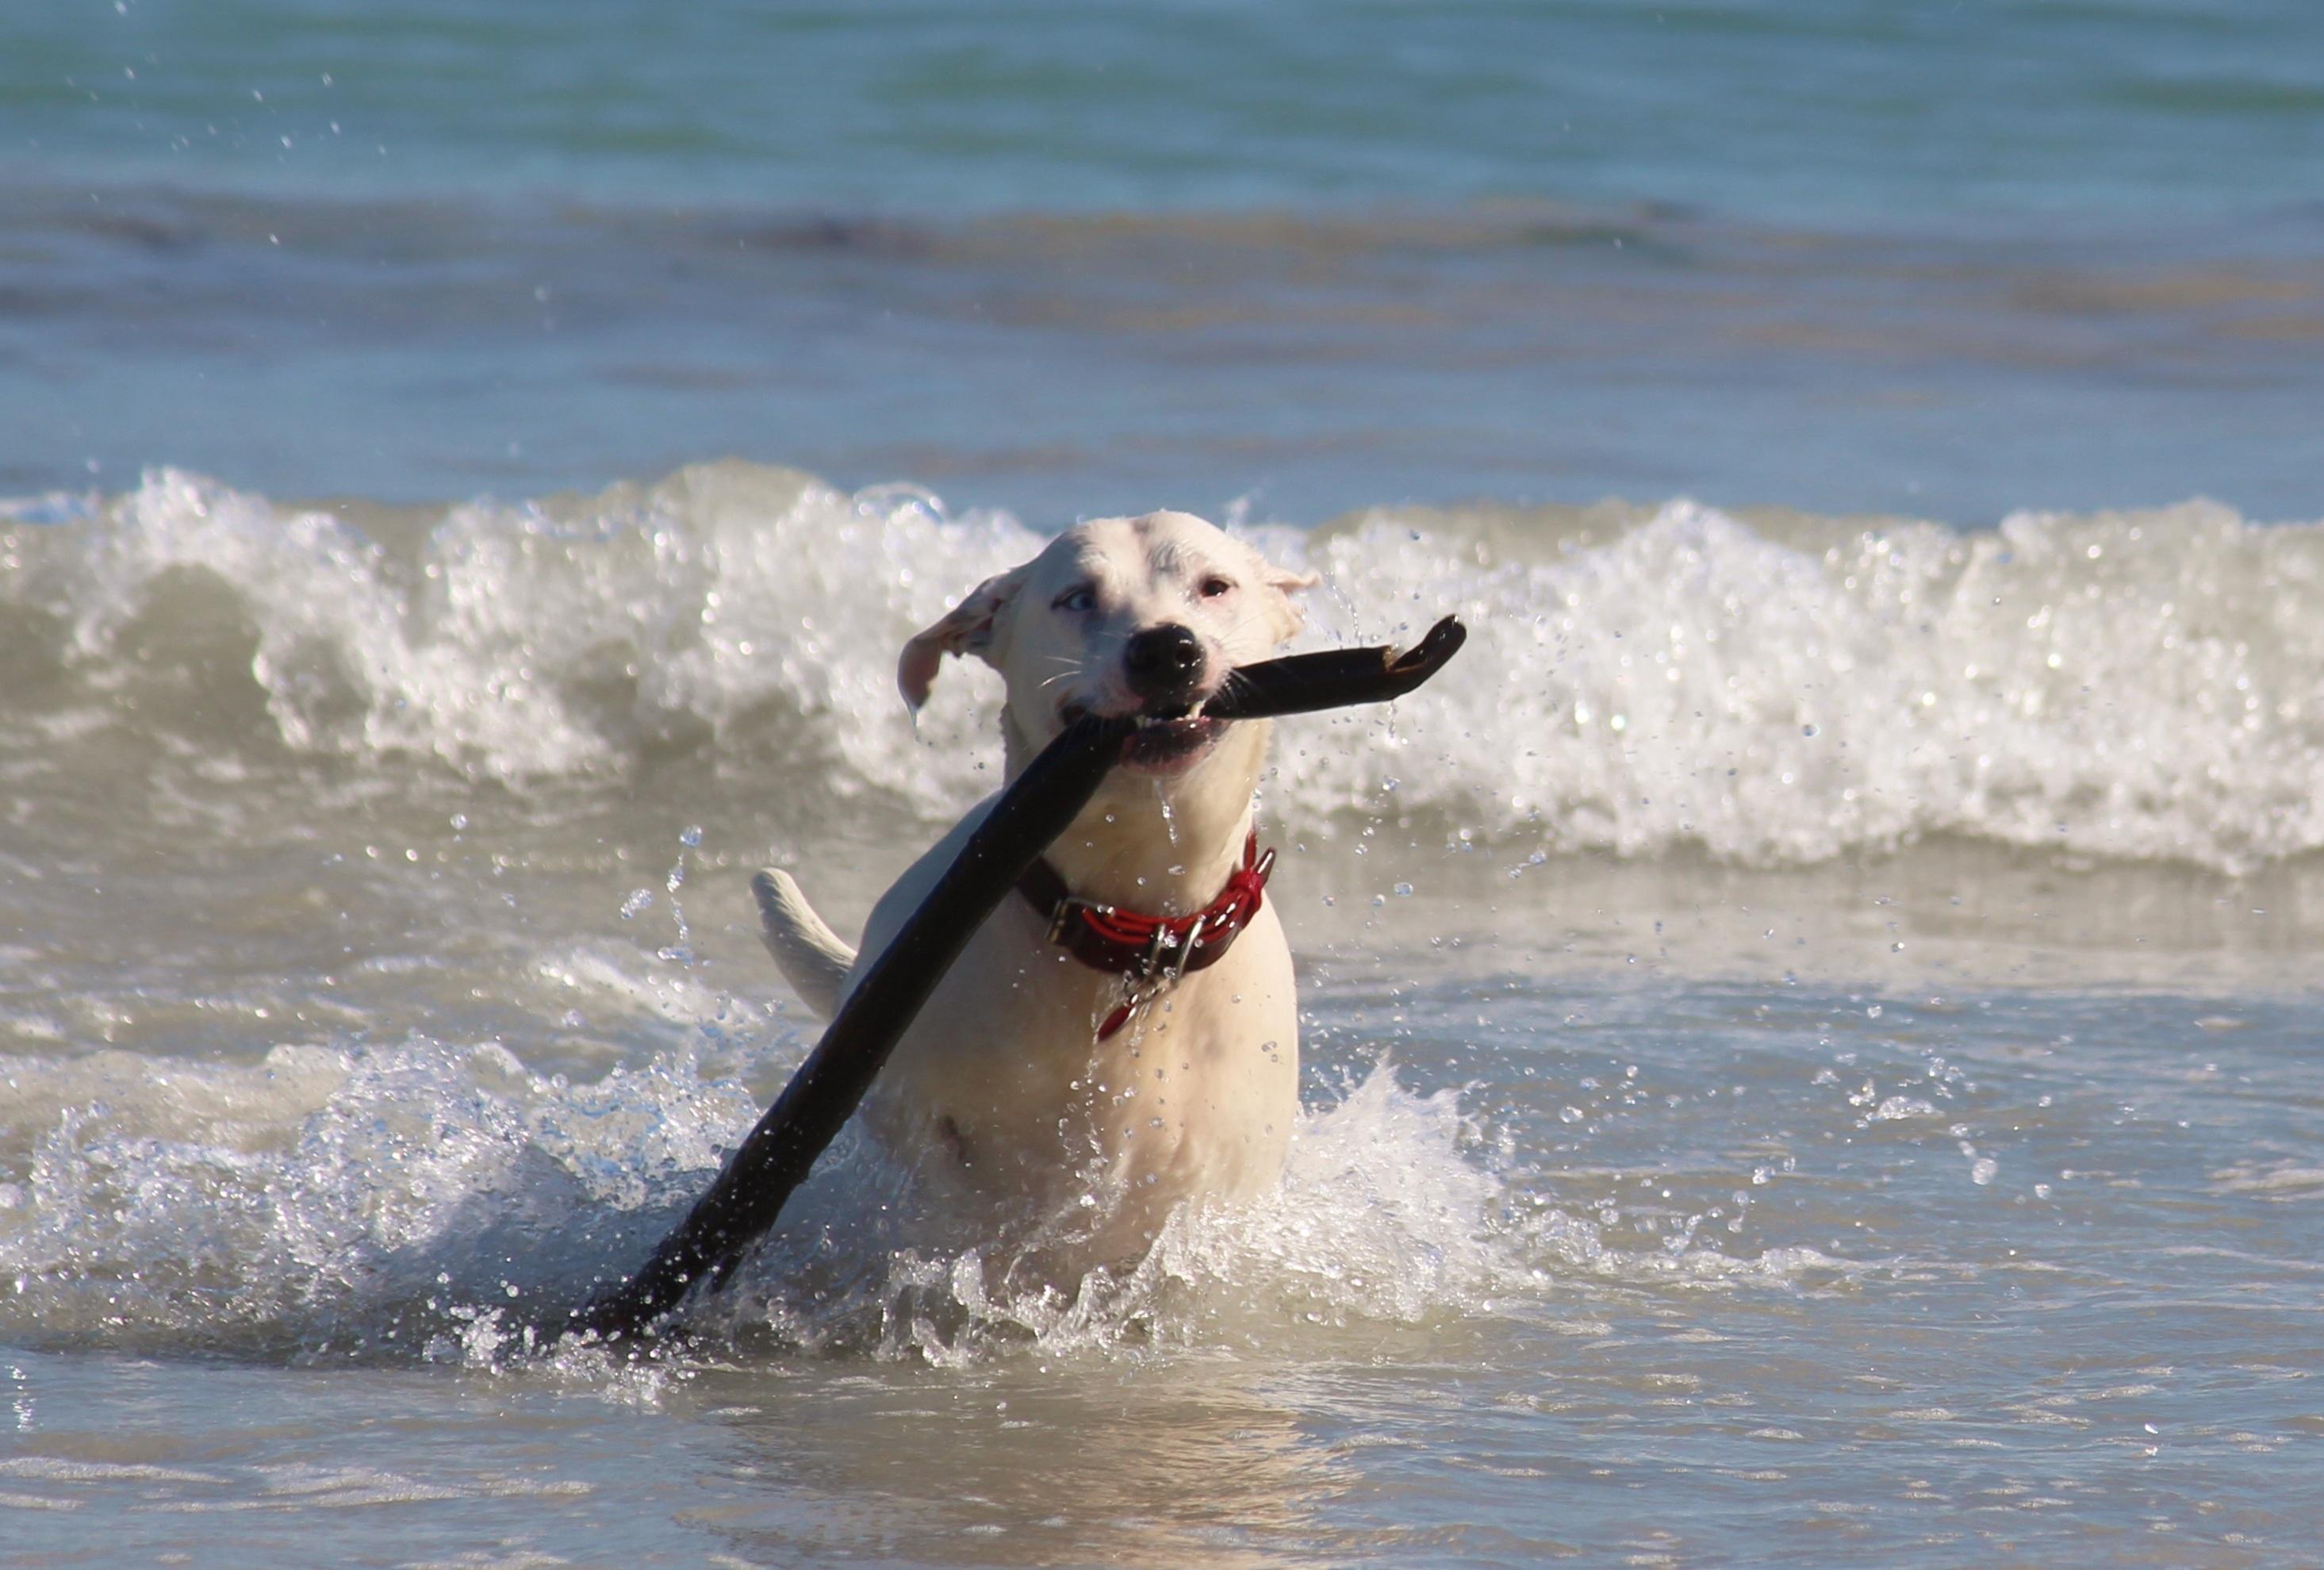 остается фото с лабрадором на море меня ливадийский